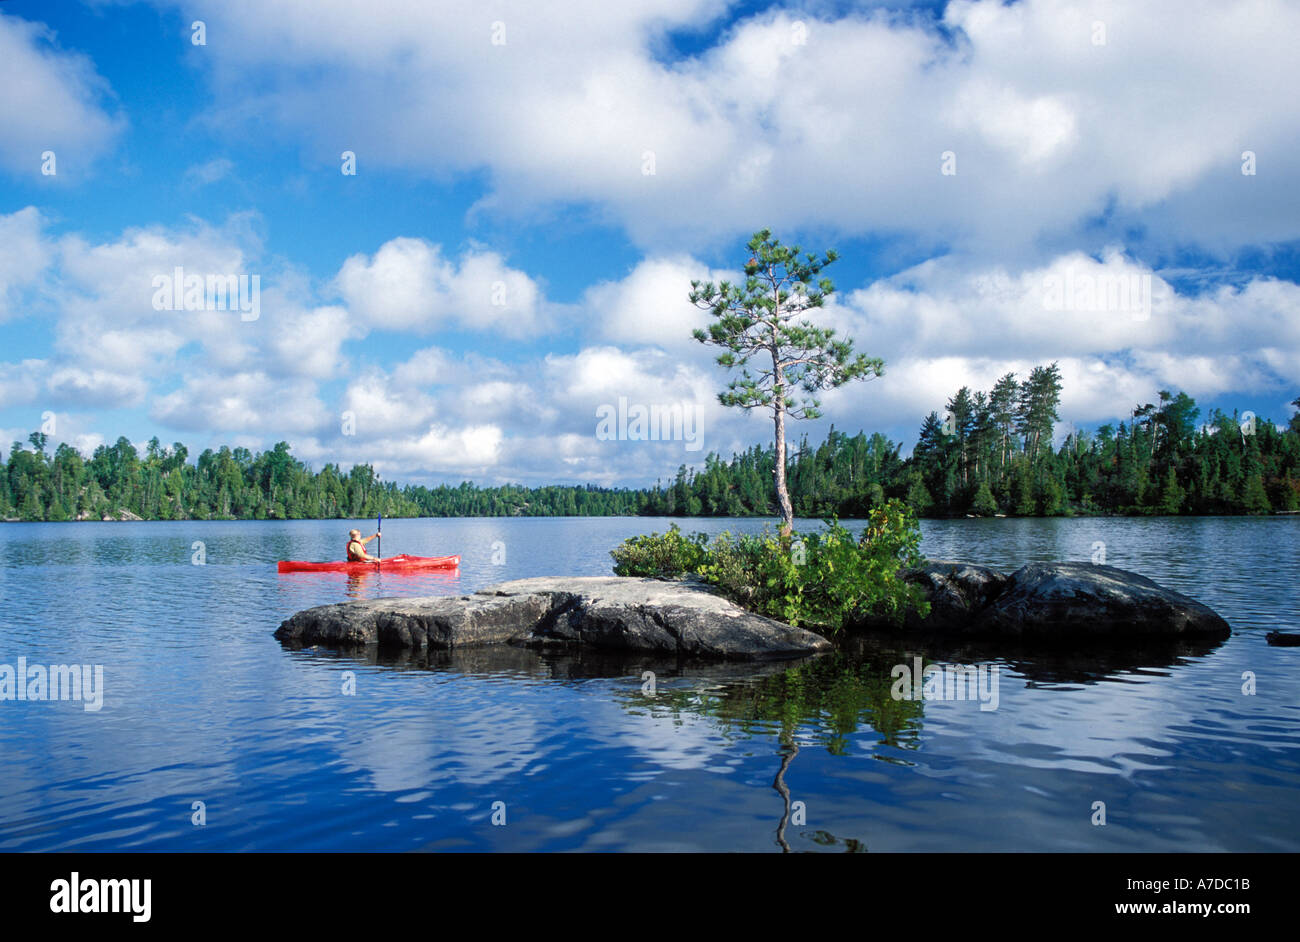 Kayaking in Boundary Waters Canoe Area Wilderness Minnesota MR - Stock Image